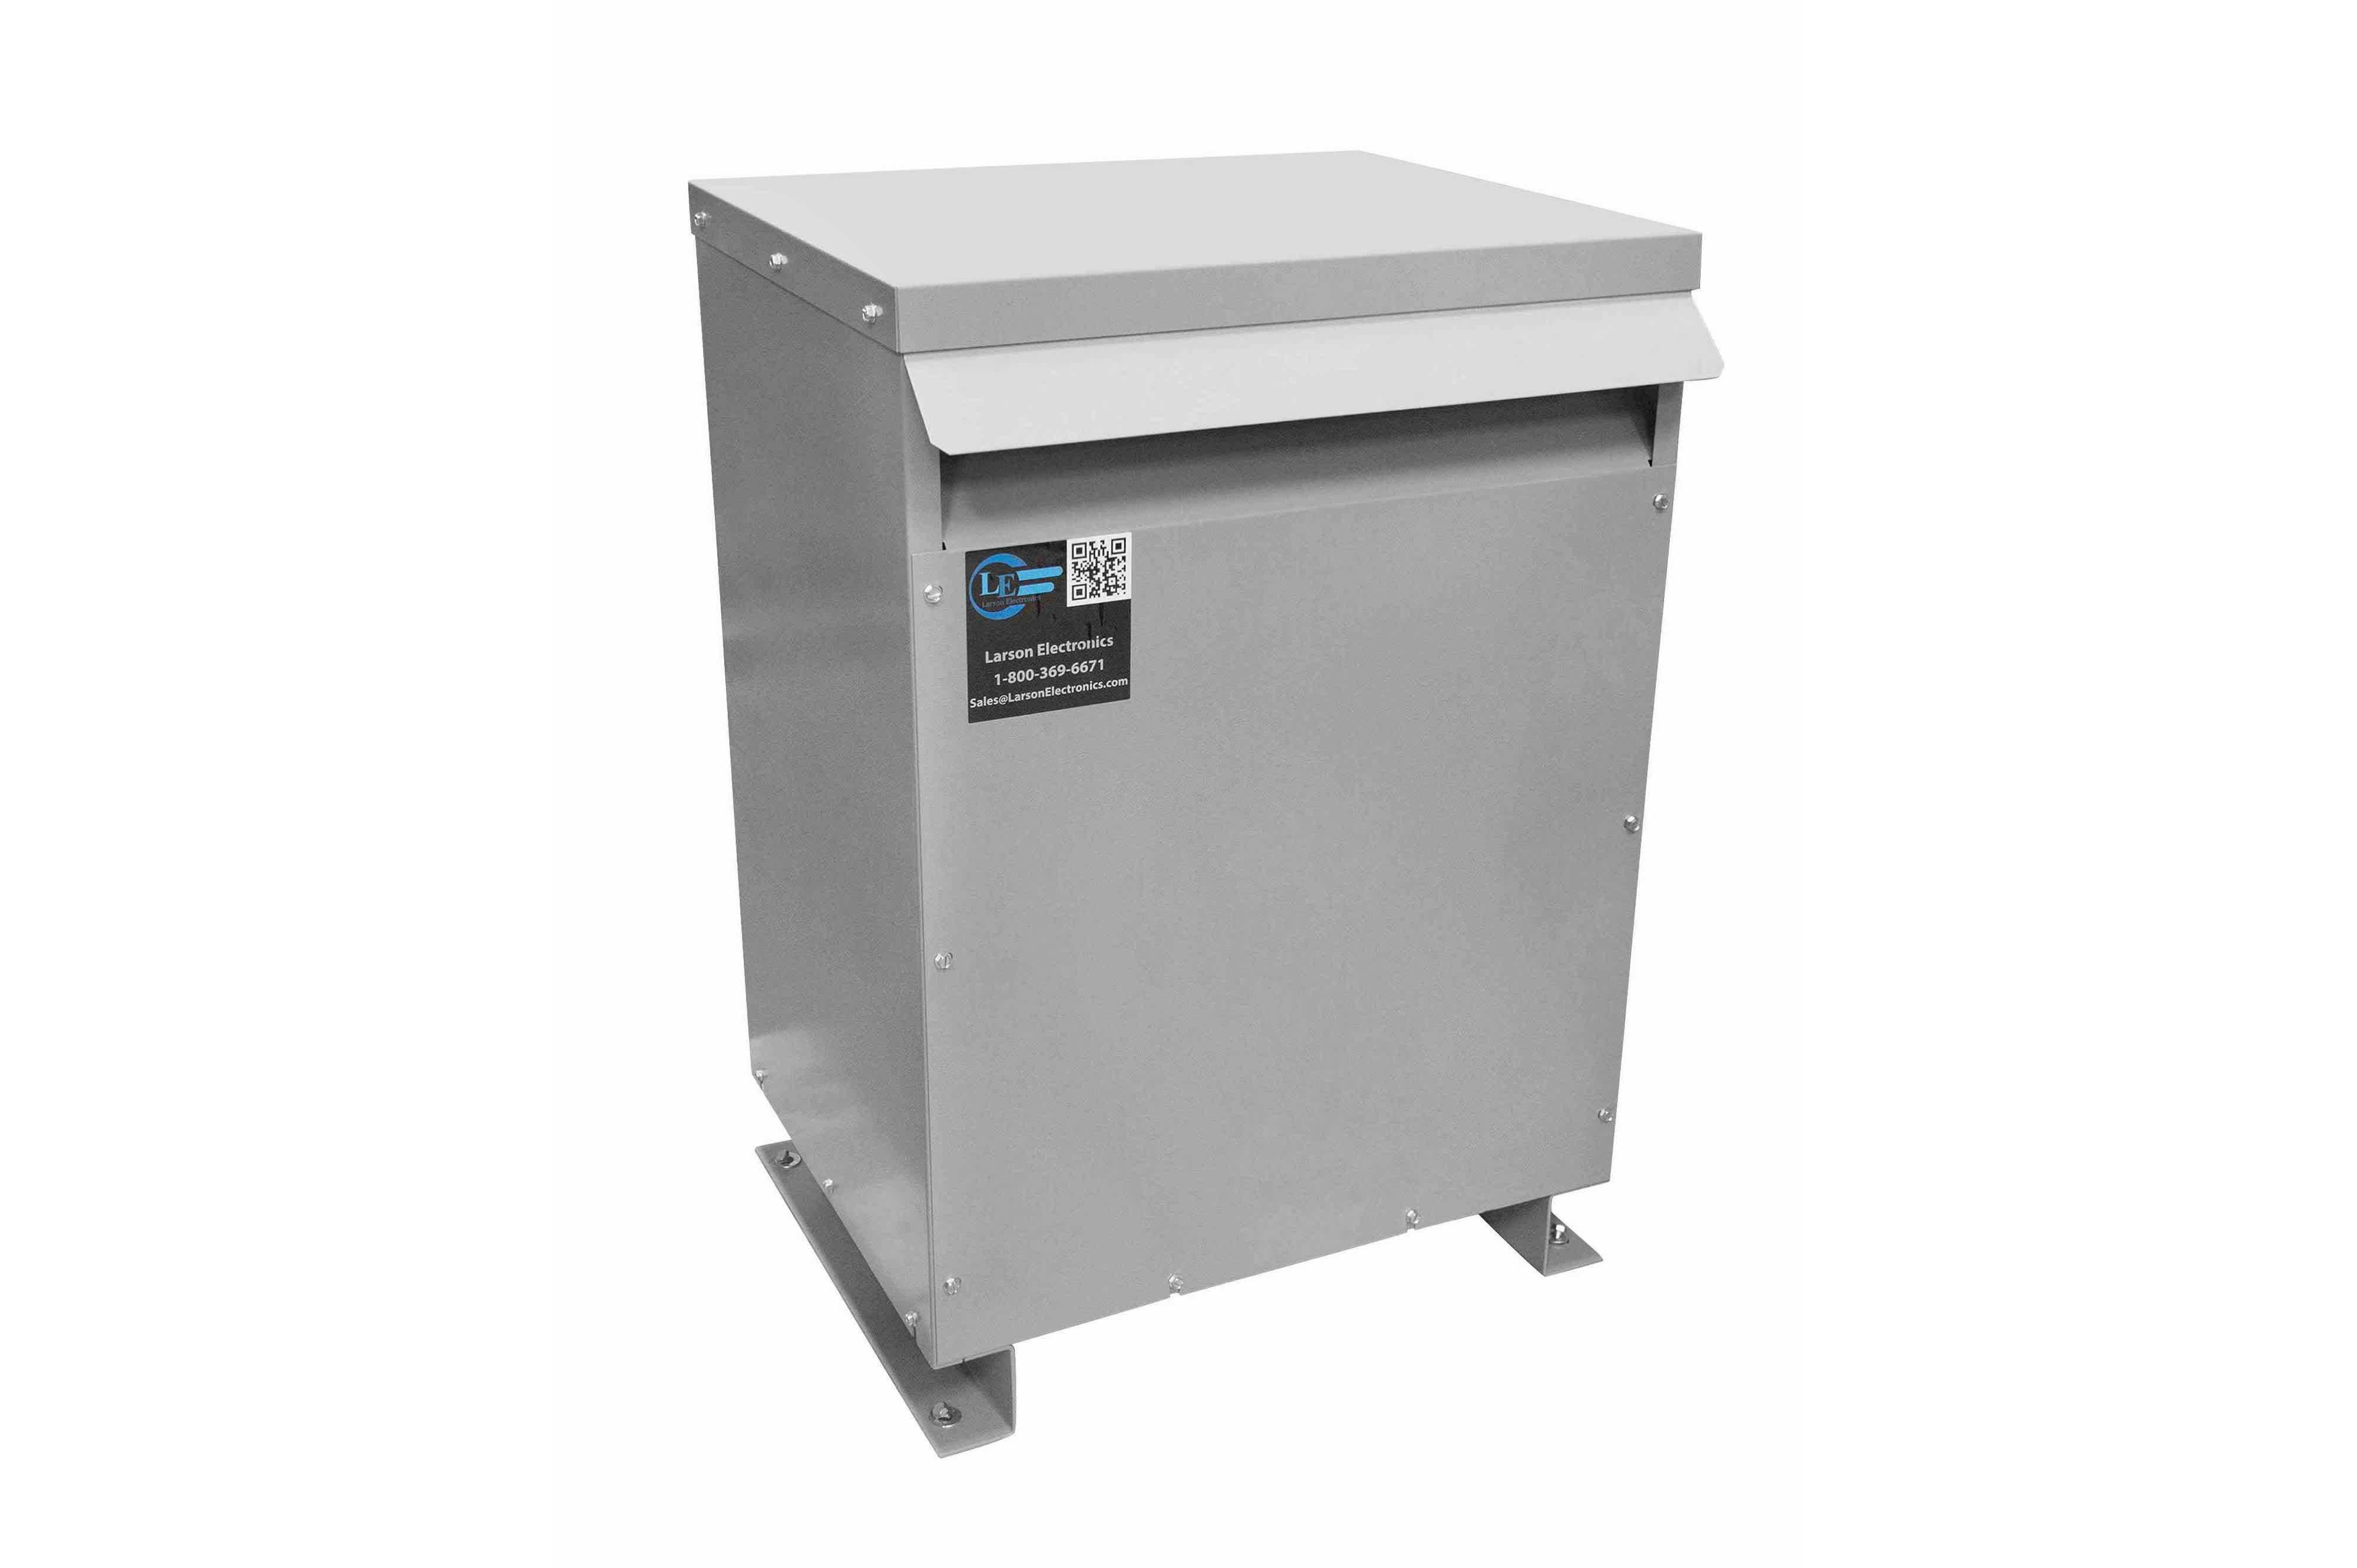 150 kVA 3PH DOE Transformer, 460V Delta Primary, 600Y/347 Wye-N Secondary, N3R, Ventilated, 60 Hz